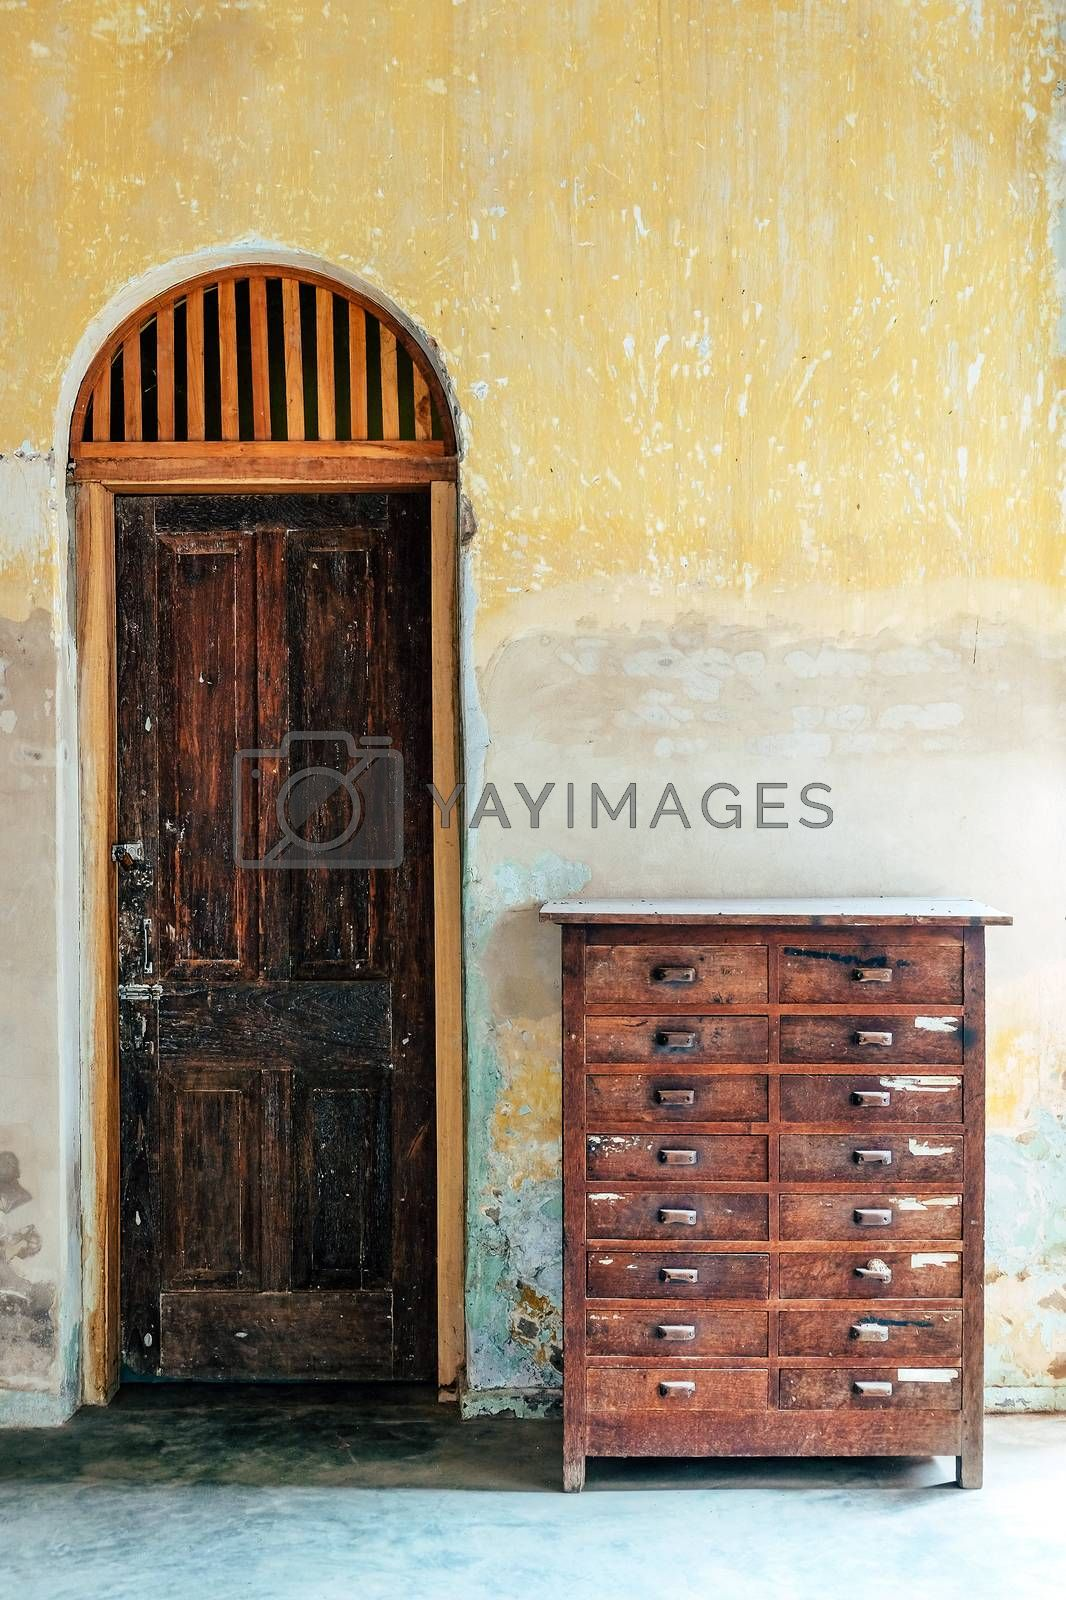 A ancient door,classical architecture building detail